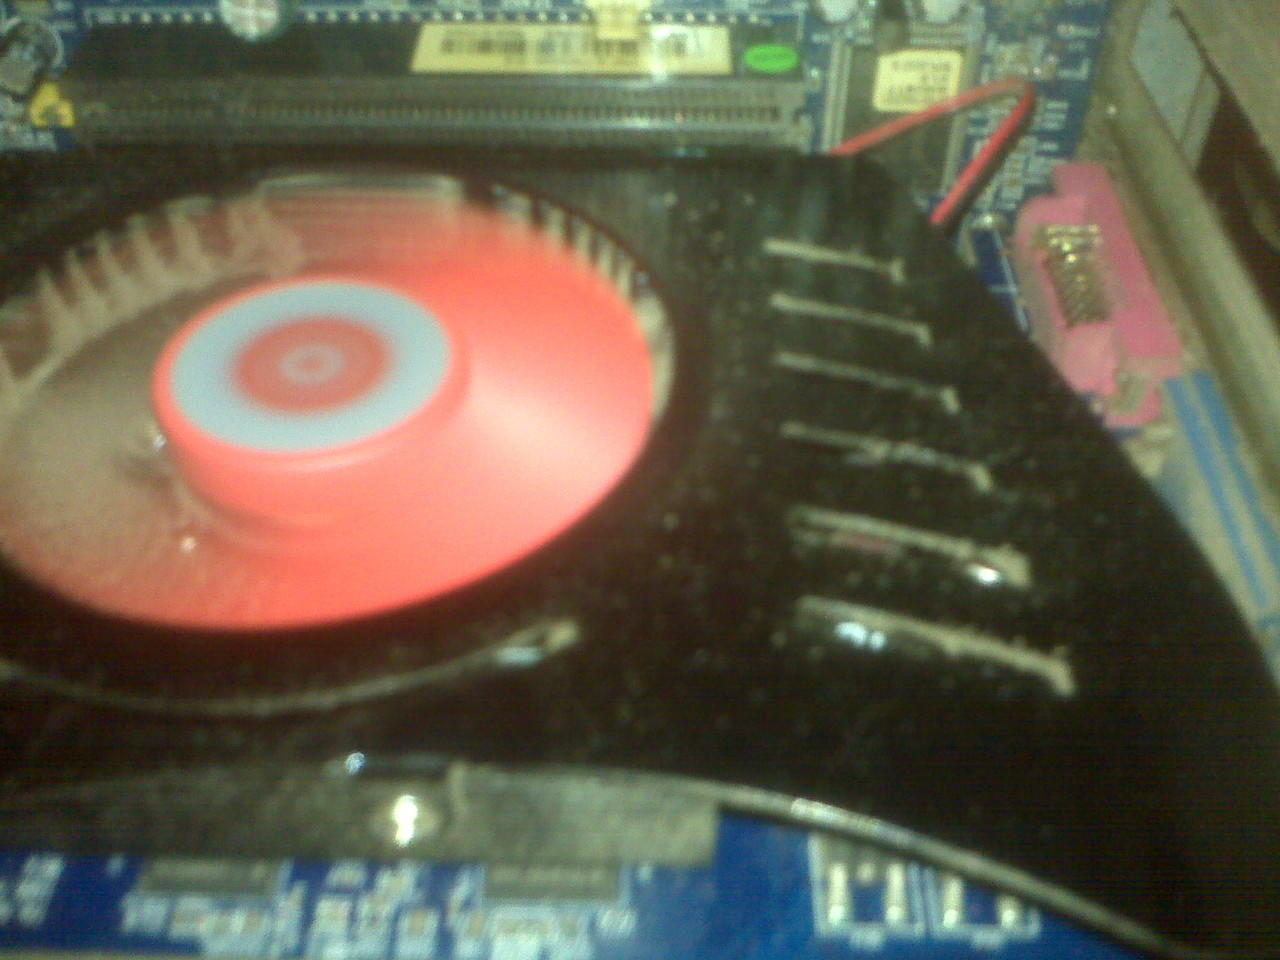 WTS/WTT Amd Phenom X4 9600BE dan vga radeon 6570